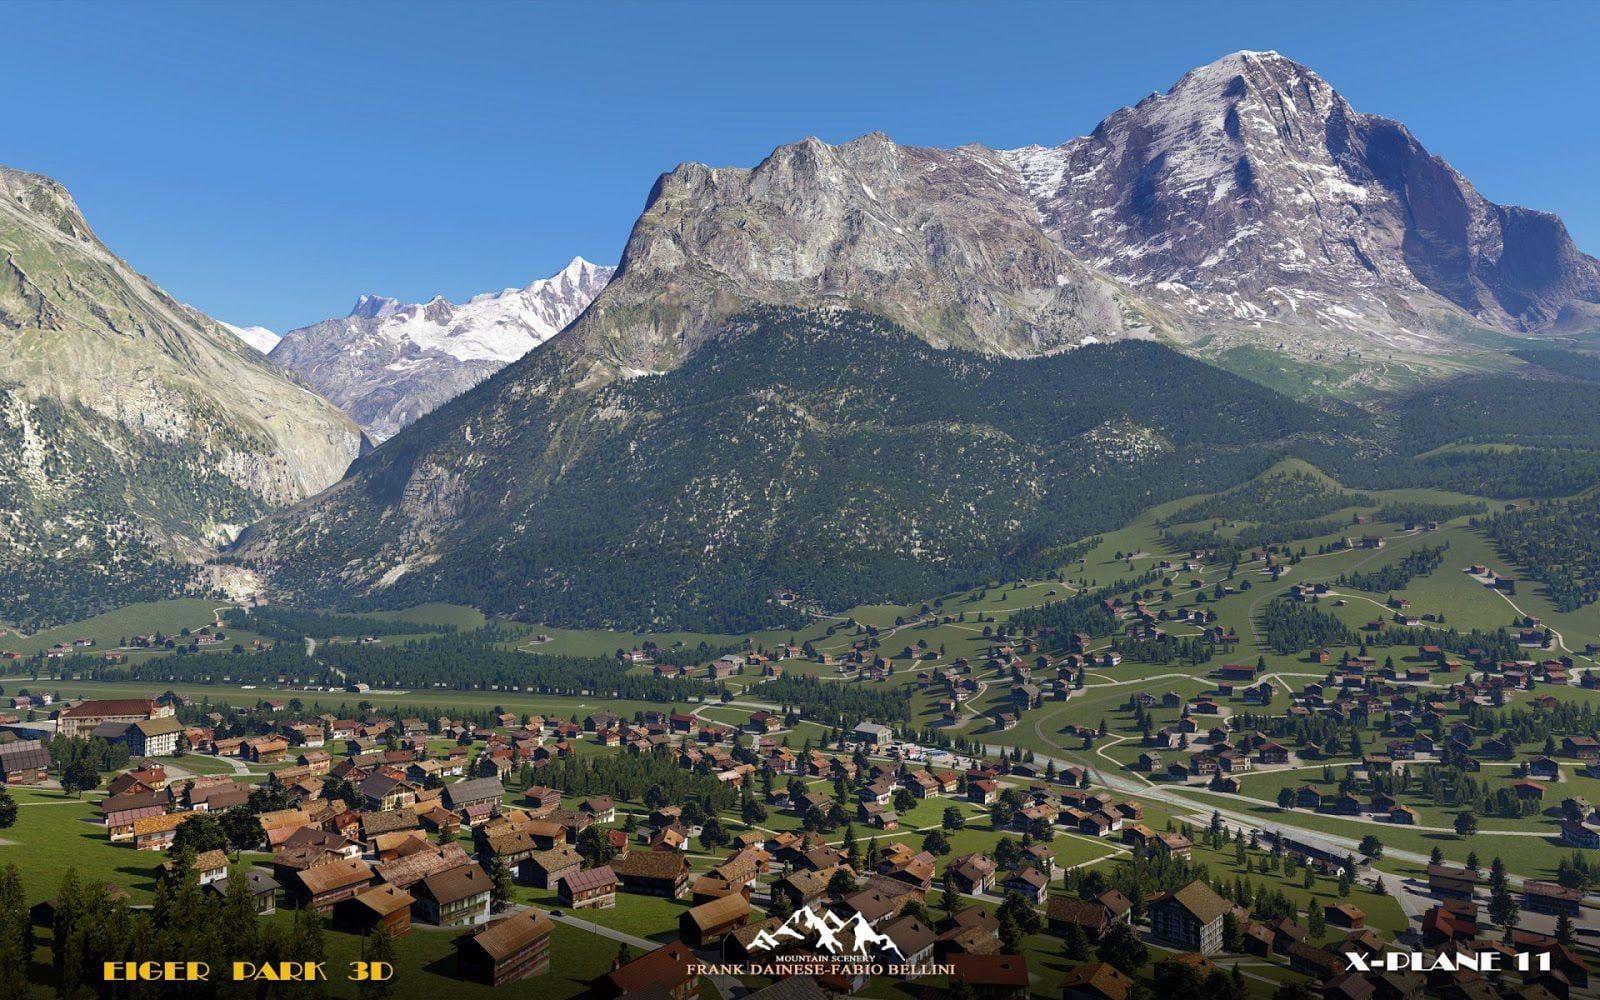 New batch of screenshots of Eiger Park 3D for X-Plane